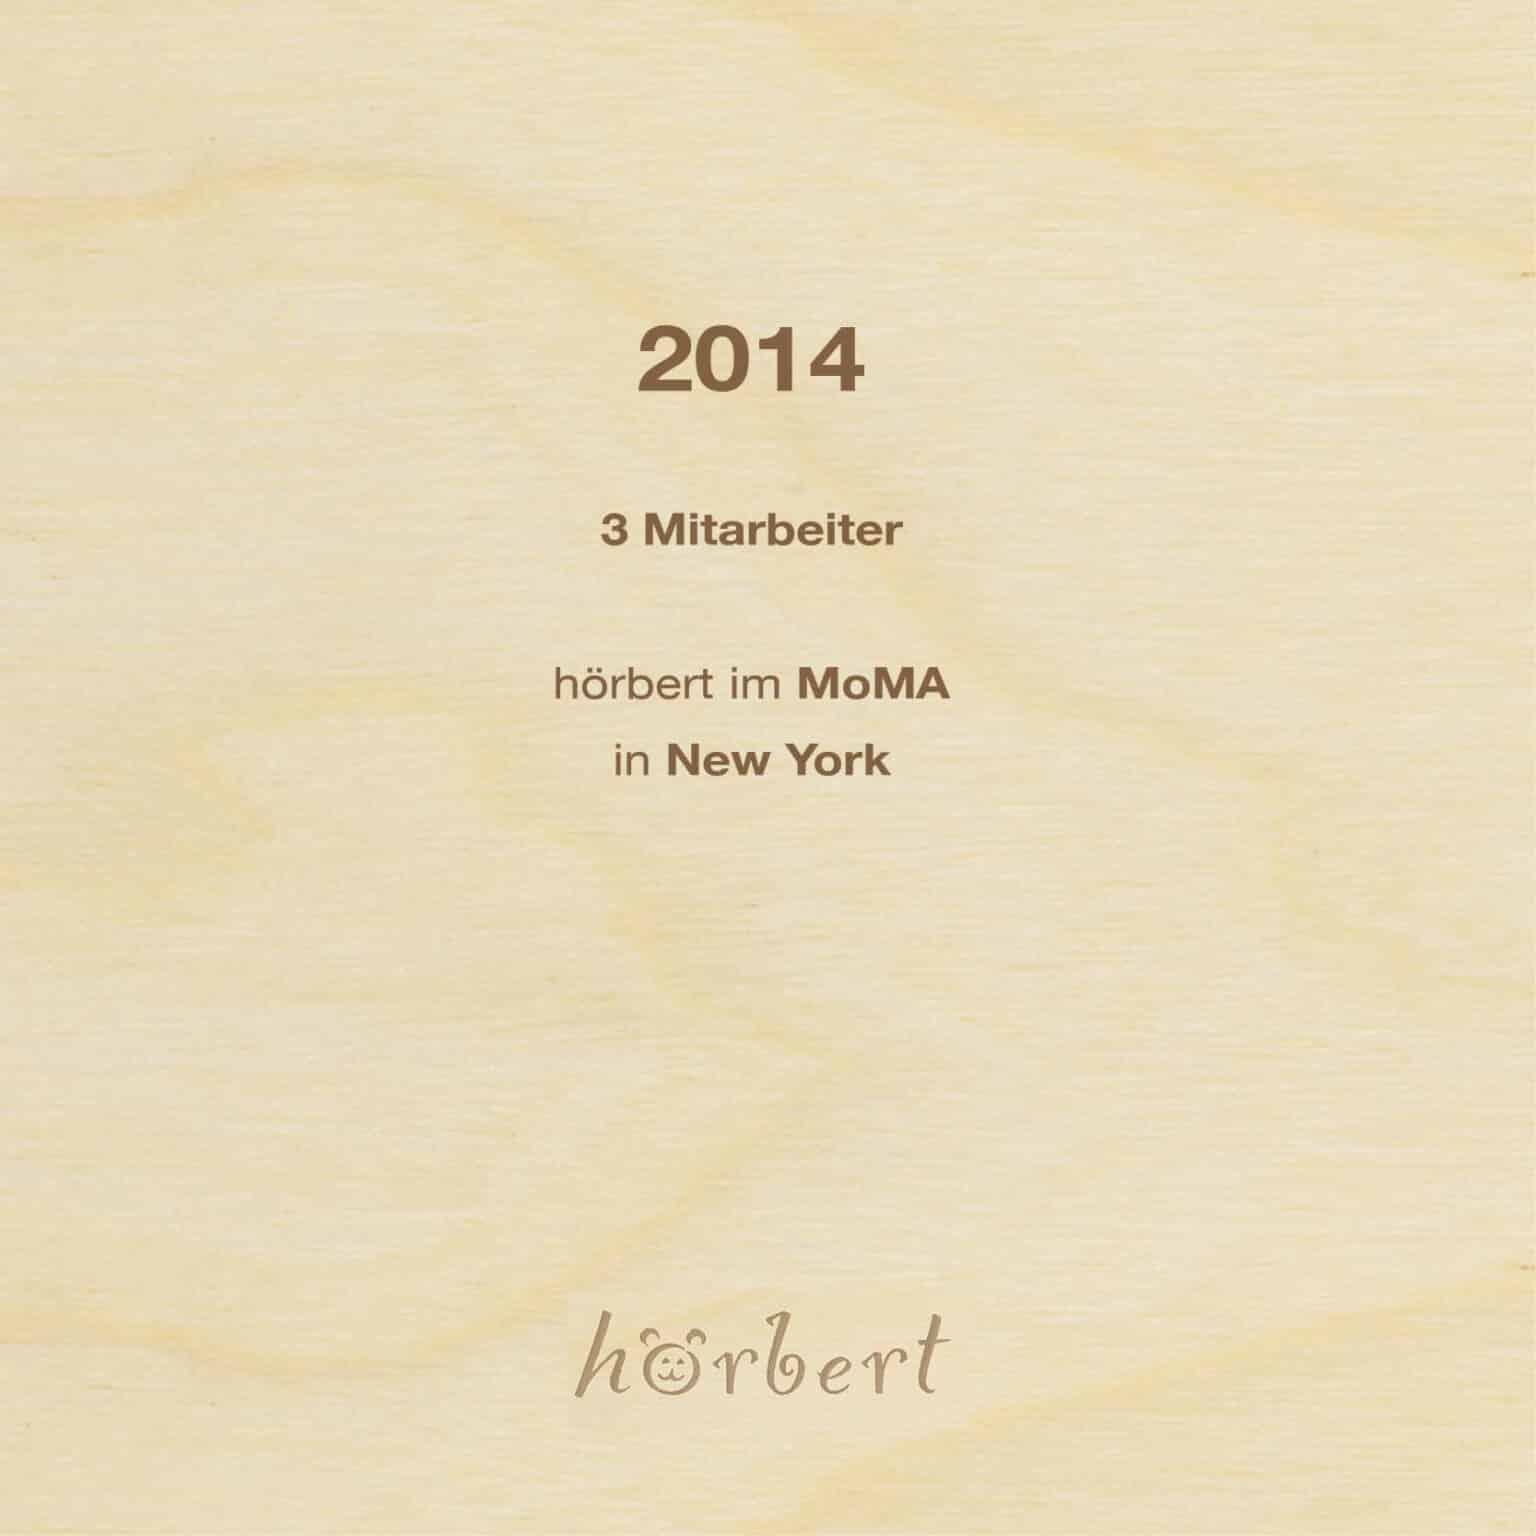 2014 MOMA New York